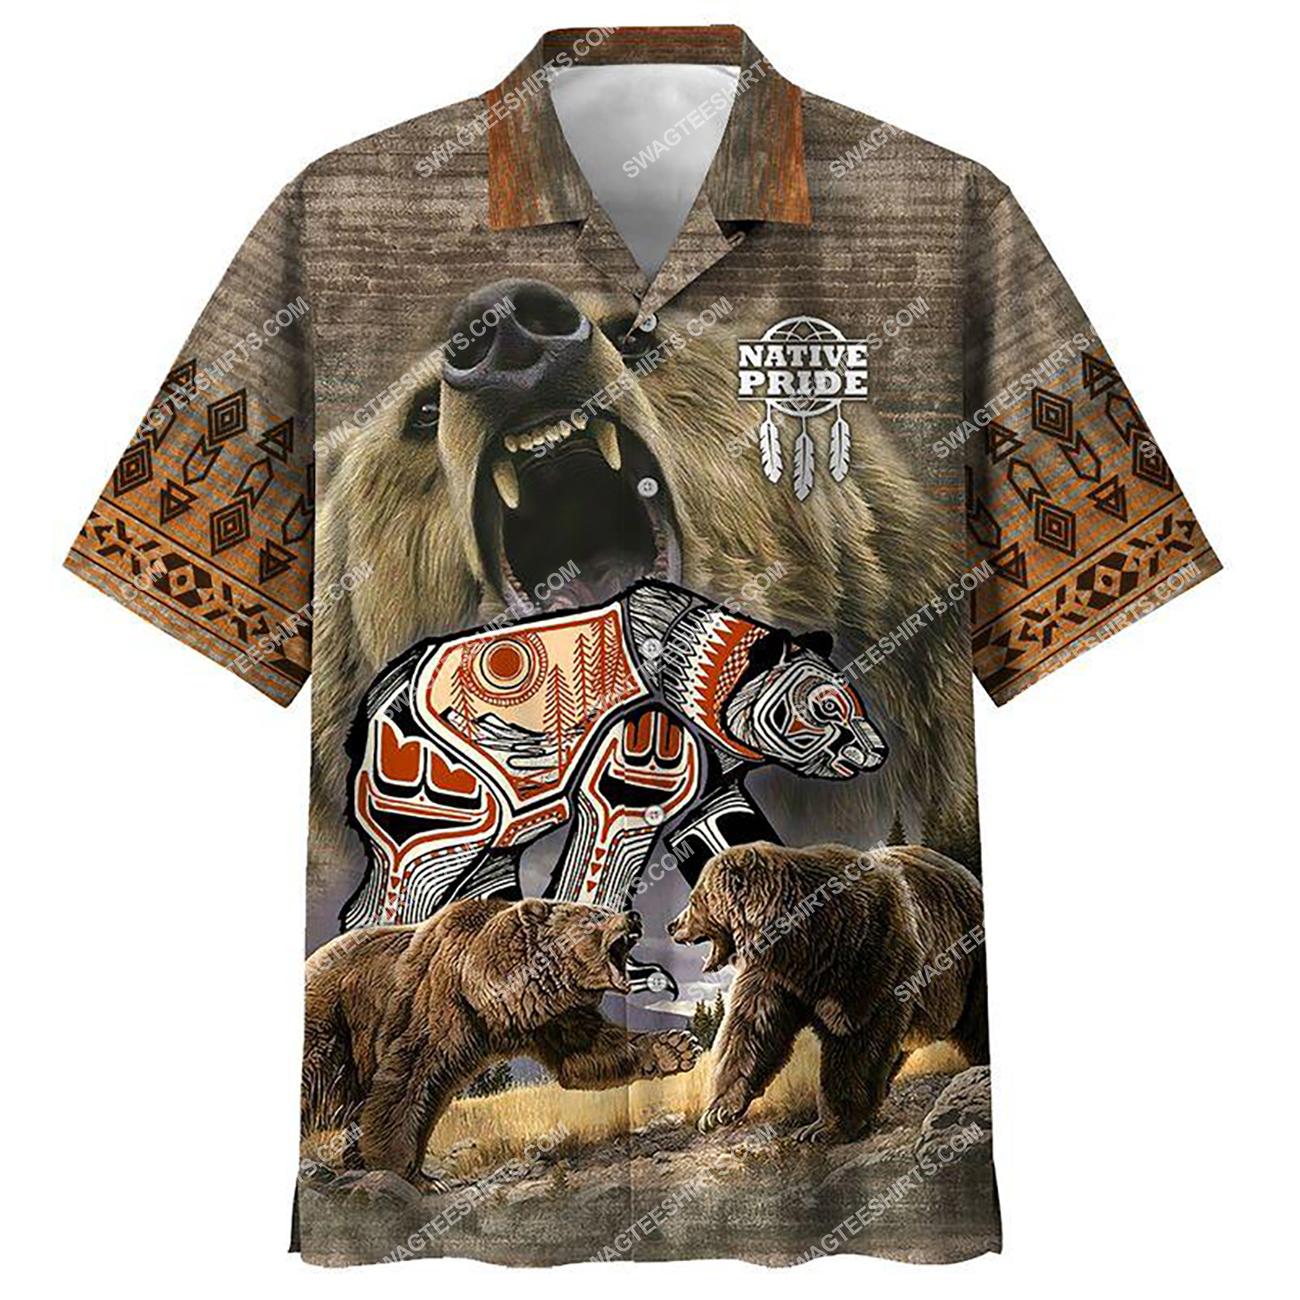 vintage native american native pride all over printed hawaiian shirt 1(3) - Copy